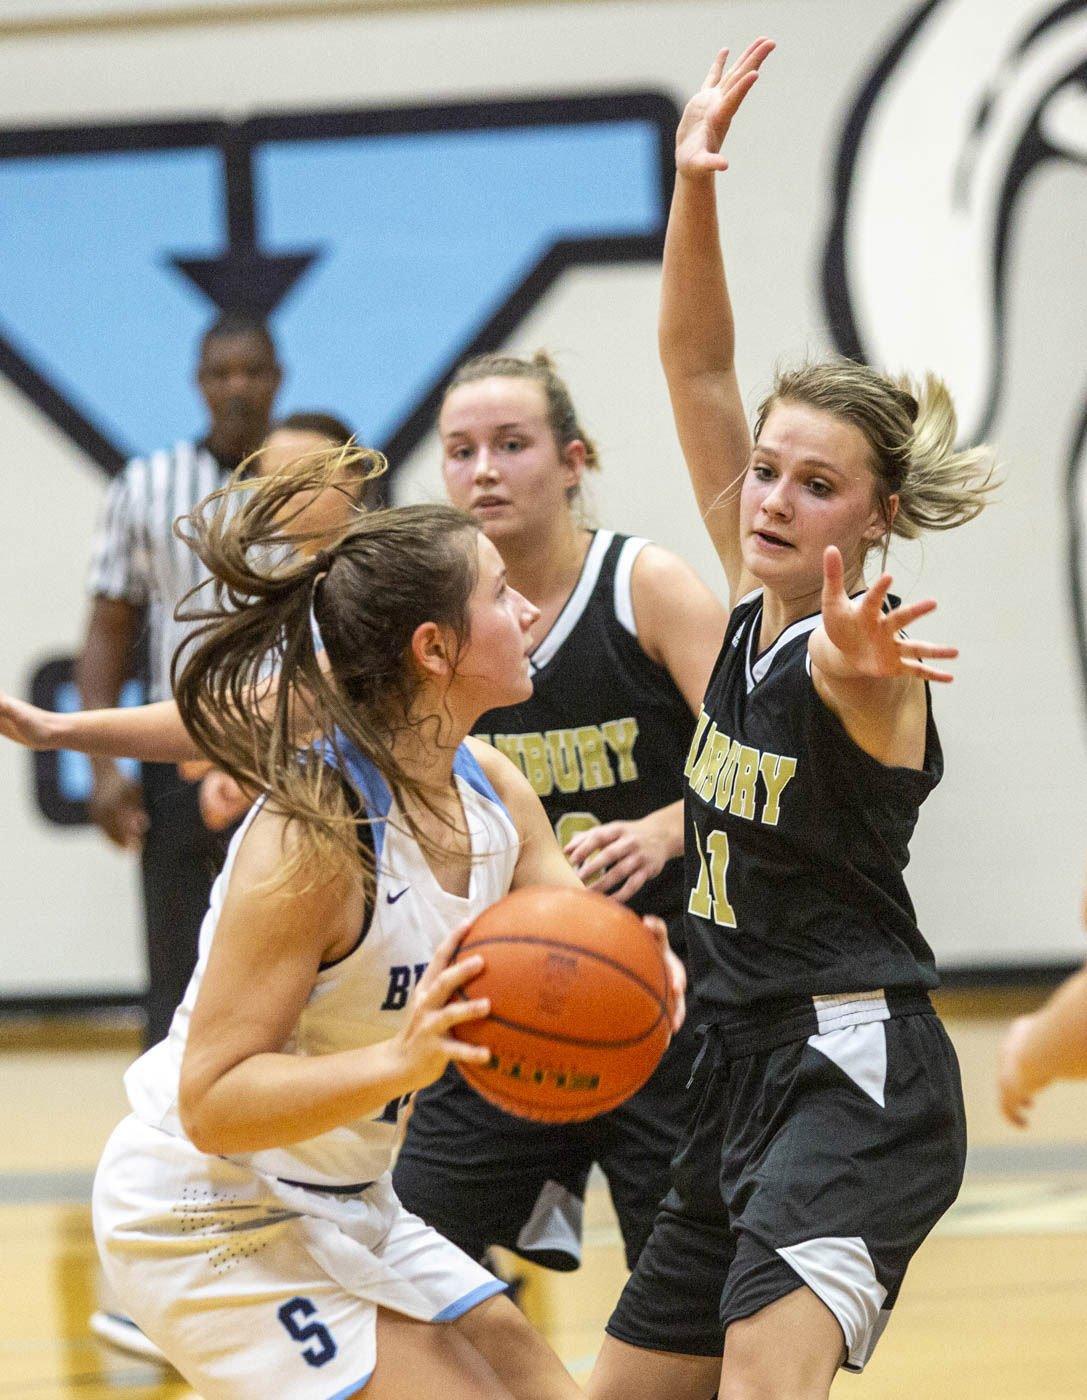 Danbury vs Sweeny Girls Basketball